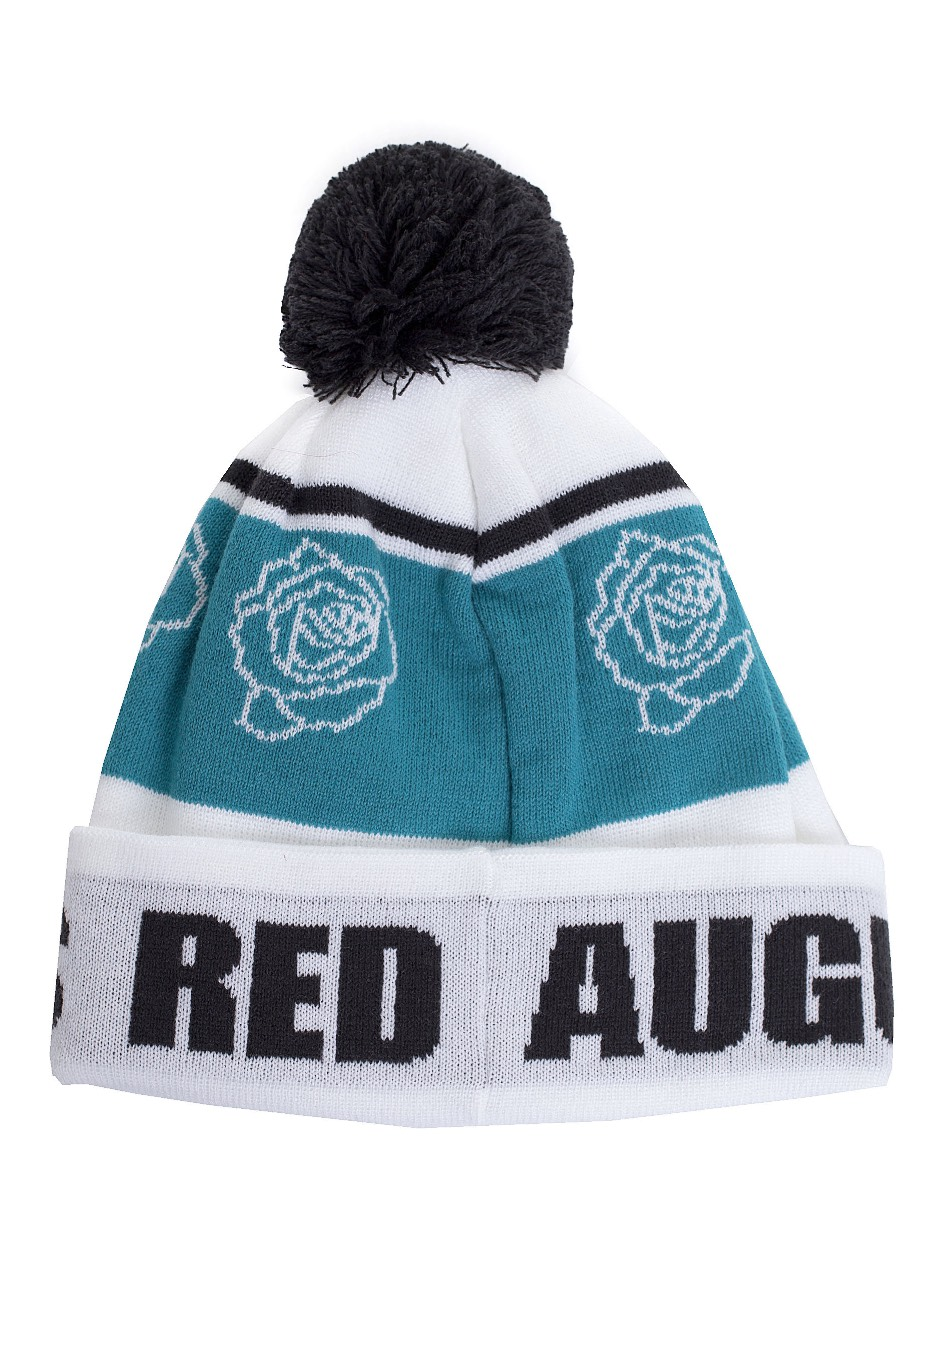 ... August Burns Red - Phantom Anthem Light Green Pom - Beanie ... 283a9046fd86